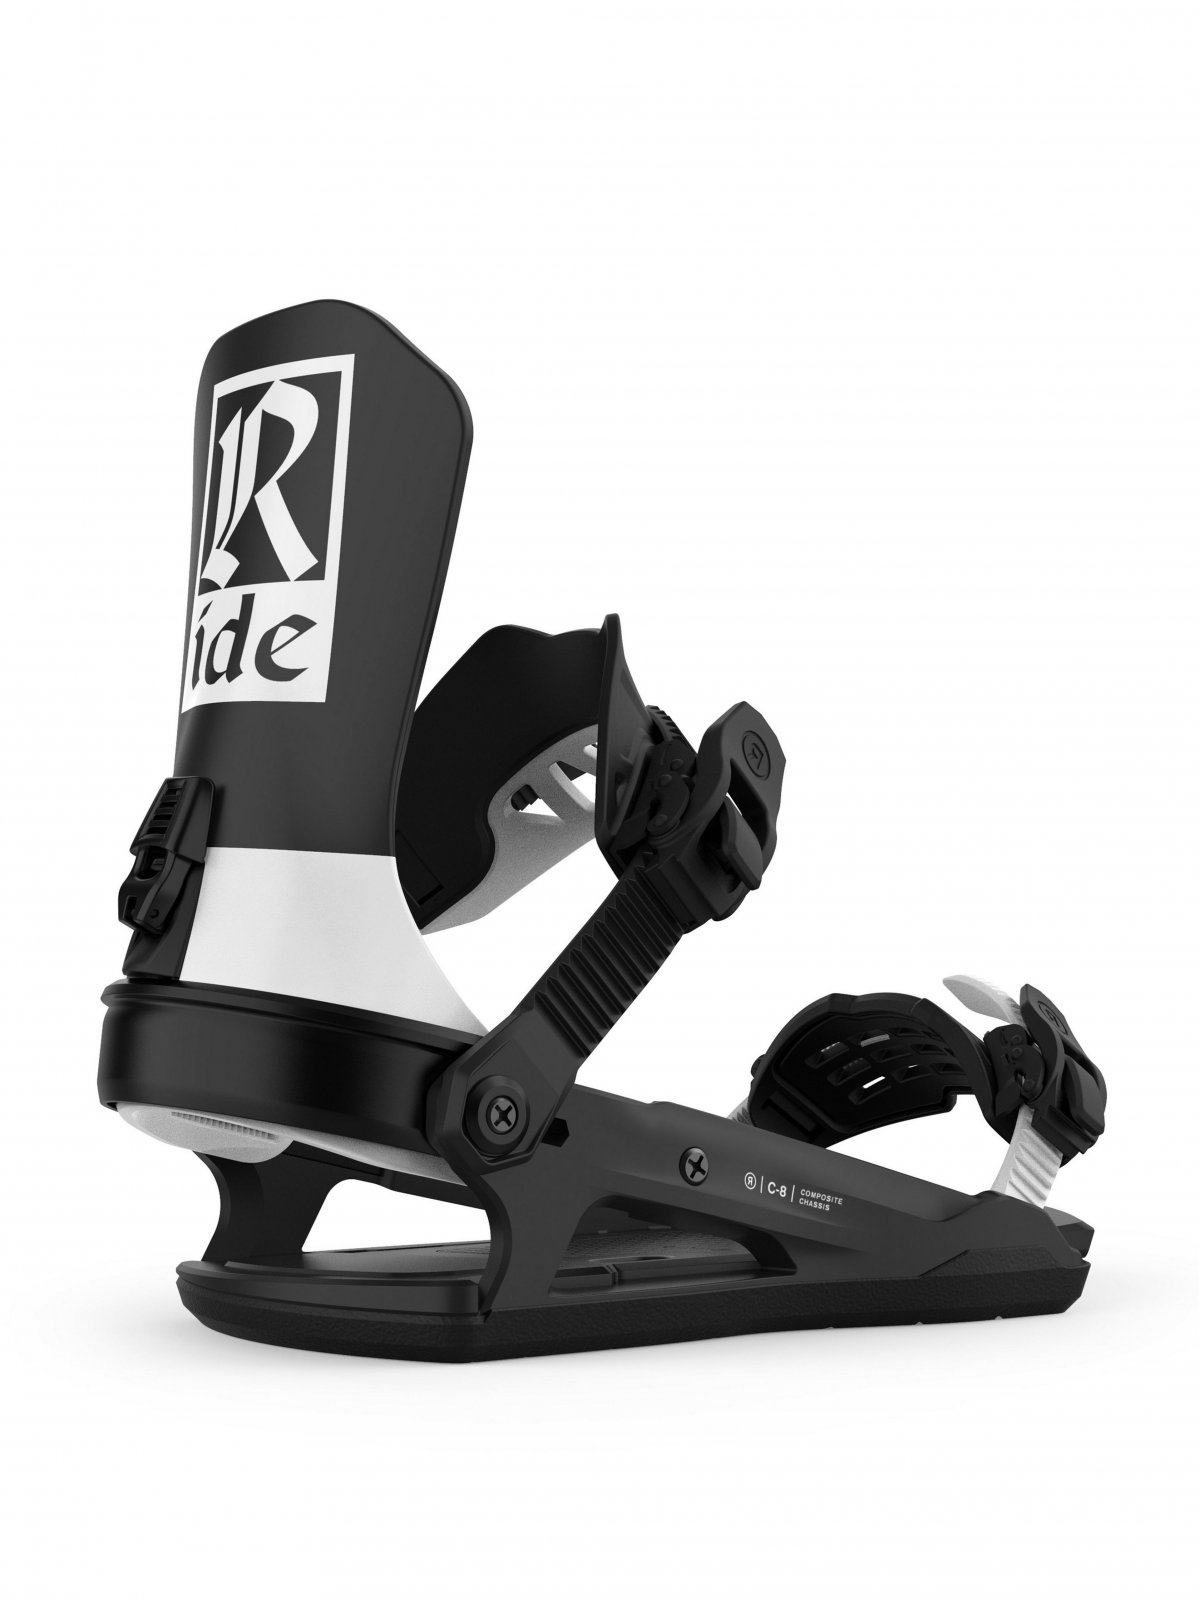 2021 Ride C-8 Men's Snowboard Bindings